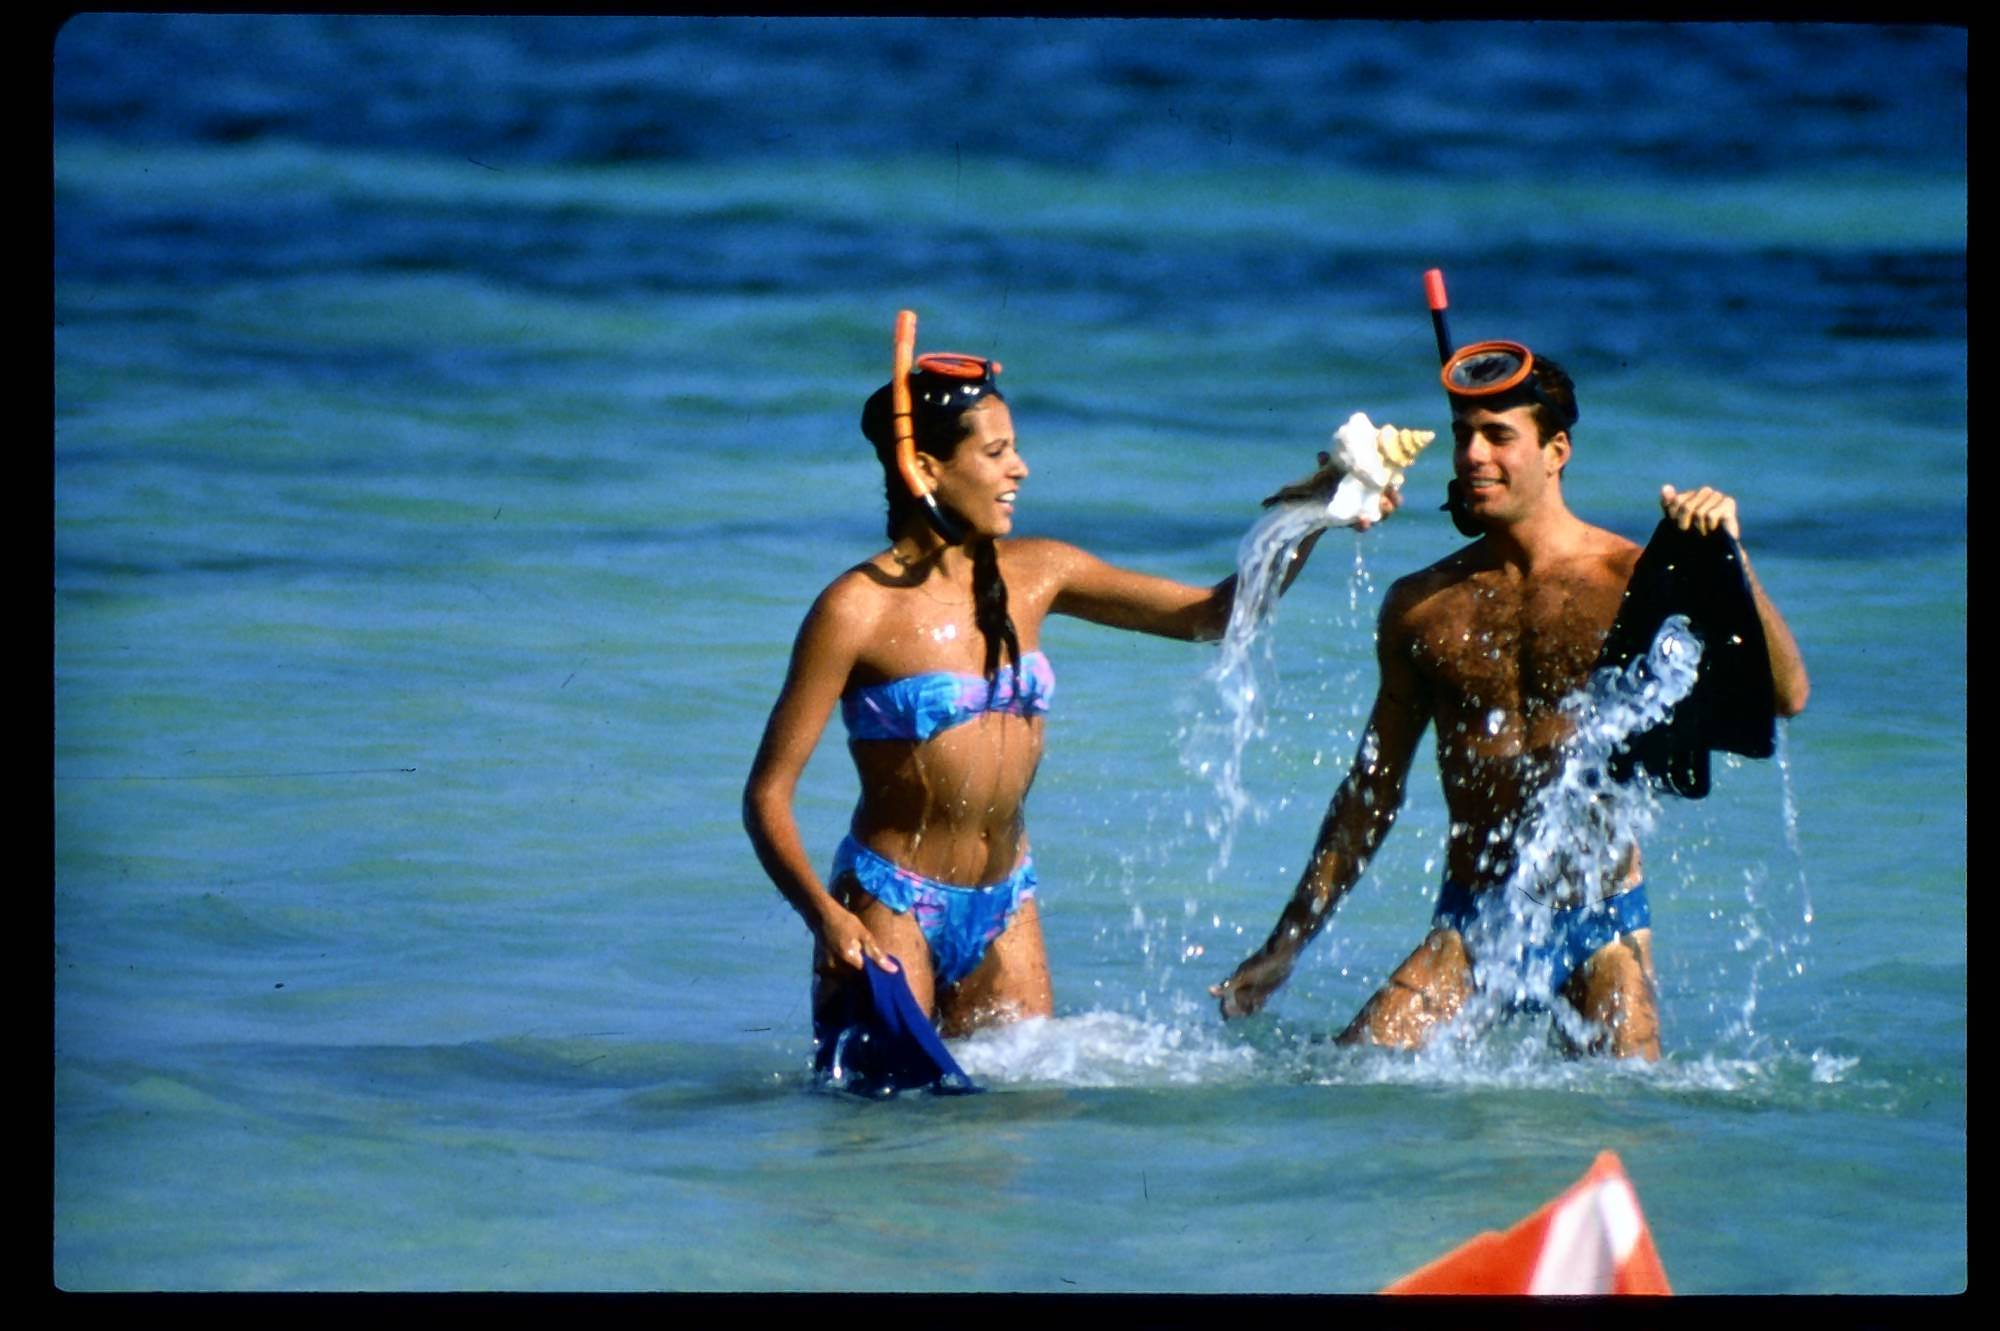 Joakim Noah Wife Naked Beach - https://www.orlandosentinel.com/features/florida360/os-david ...